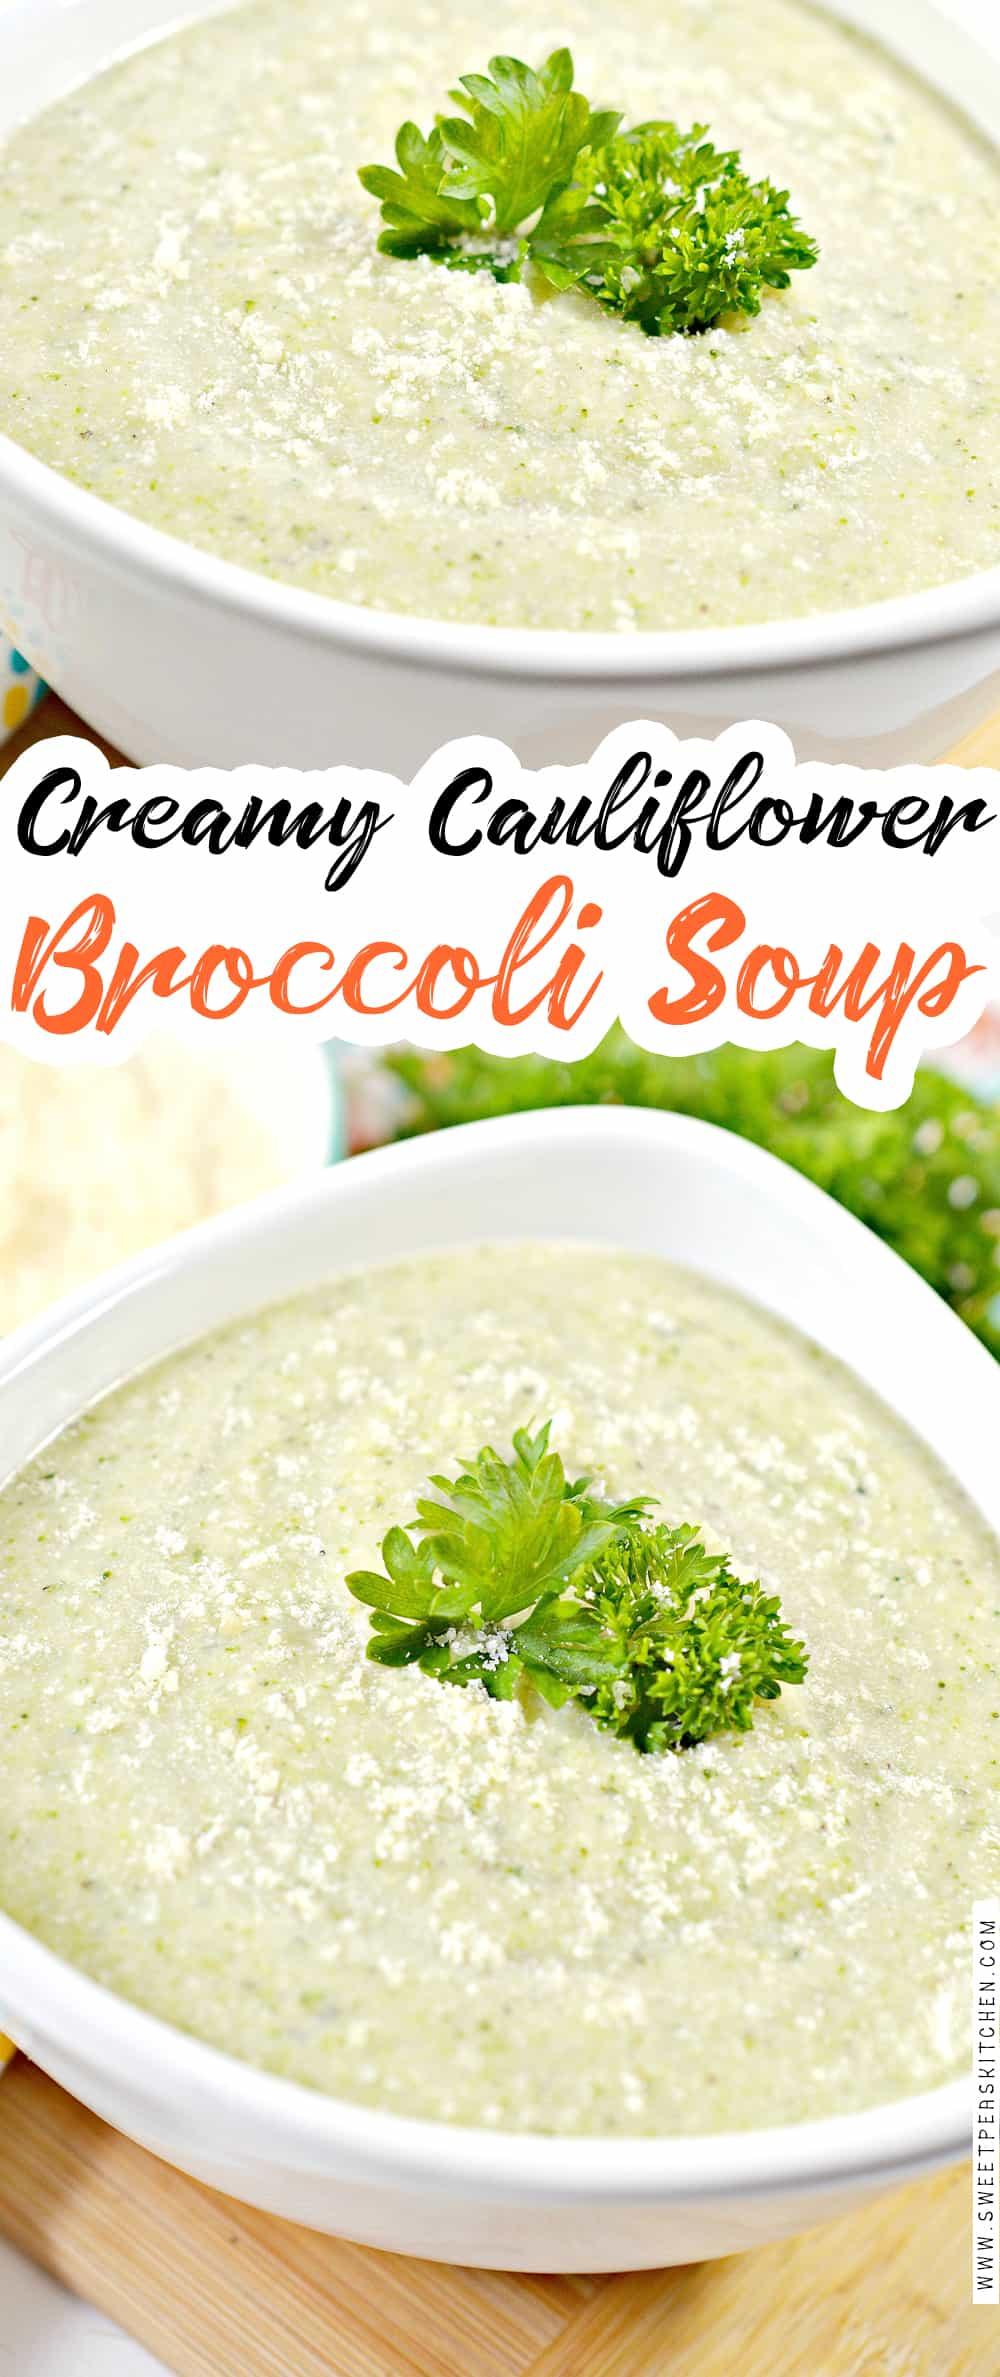 Creamy Cauliflower and Broccoli Soup